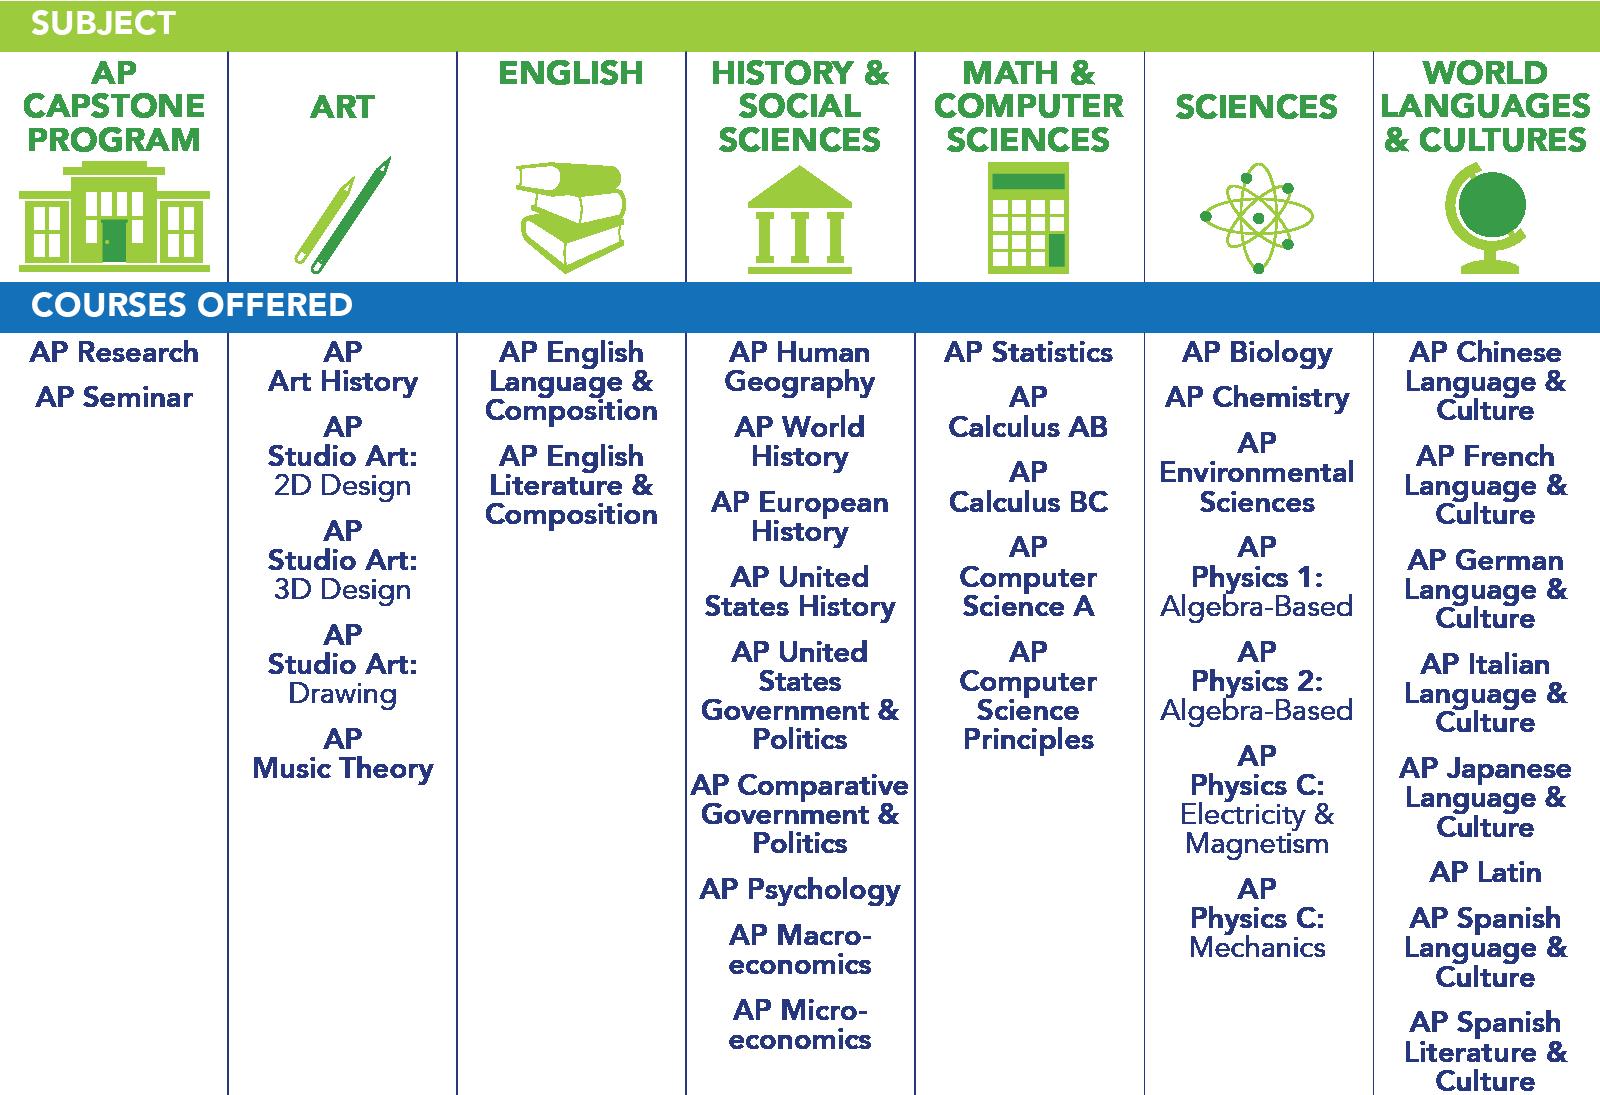 AP Capstone Program: AP Research, AP Seminar. Art: AP Art History, AP Studio Art - 2D Design, AP Studio Art - 3D Design, AP Studio Art - Drawing, AP Music Theory. English: AP English Language and Composition, AP English Literature and Composition. History and Social Sciences: AP Human Geography, AP World History, AP European History, AP United States History, AP United States Government and Politics, AP Comparative Government and Politics, AP Psychology, AP Macroeconomics, AP Microeconomics. Math and Computer Sciences: AP Statistics, AP Calculus AB, AP Calculus BC, AP Computer Science A, AP Computer Science Principles. Sciences: AP Biology, AP Chemistry, AP Environmental Sciences, AP Physics 1 - Algebra Based, AP Physics 2 - Algebra Based, AP Physics C - Electricity and Magnetism, AP Physics C - Mechanics. World Languages and Cultures: AP Chinese Language and Culture, AP French Language and Culture, AP German Language and Culture, AP Italian Language and Culture, AP Japanese Language and Culture, AP Latin, AP Spanish Language and Culture, AP Spanish Literature and Culture.